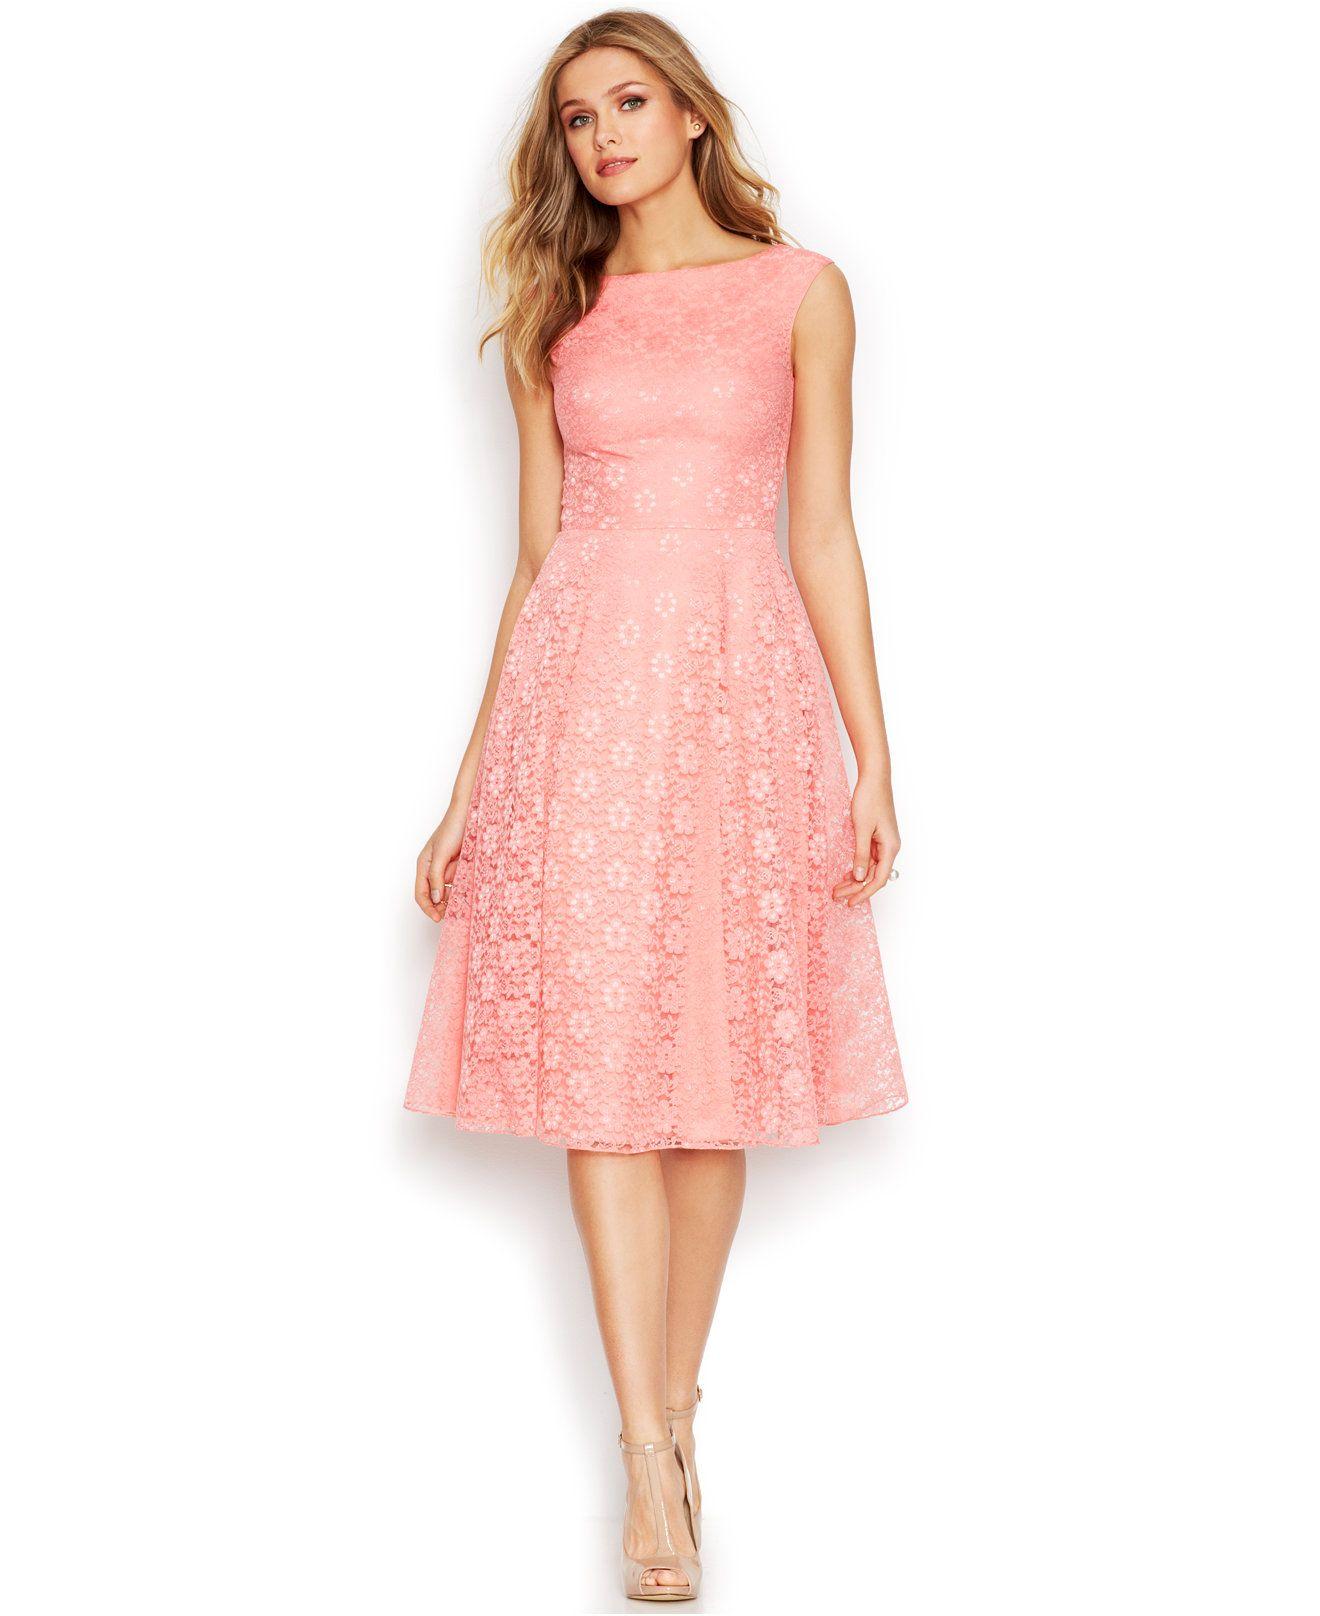 Macy S Wedding Day Dresses: Betsey Johnson Floral-Lace Tea-Length Dress